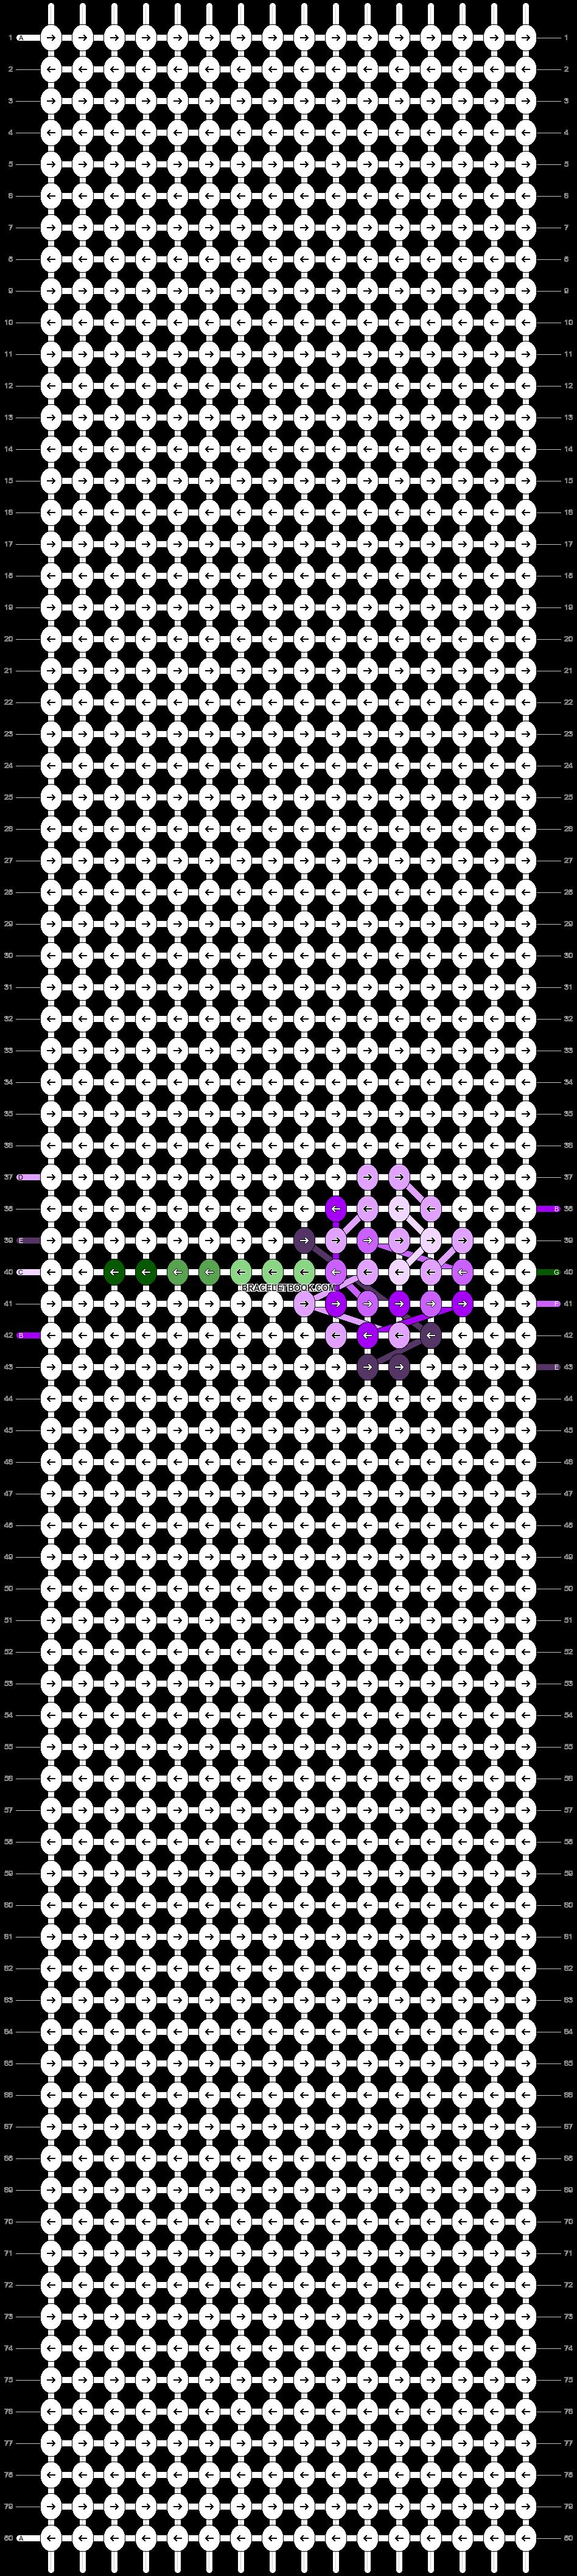 Alpha pattern #48406 pattern